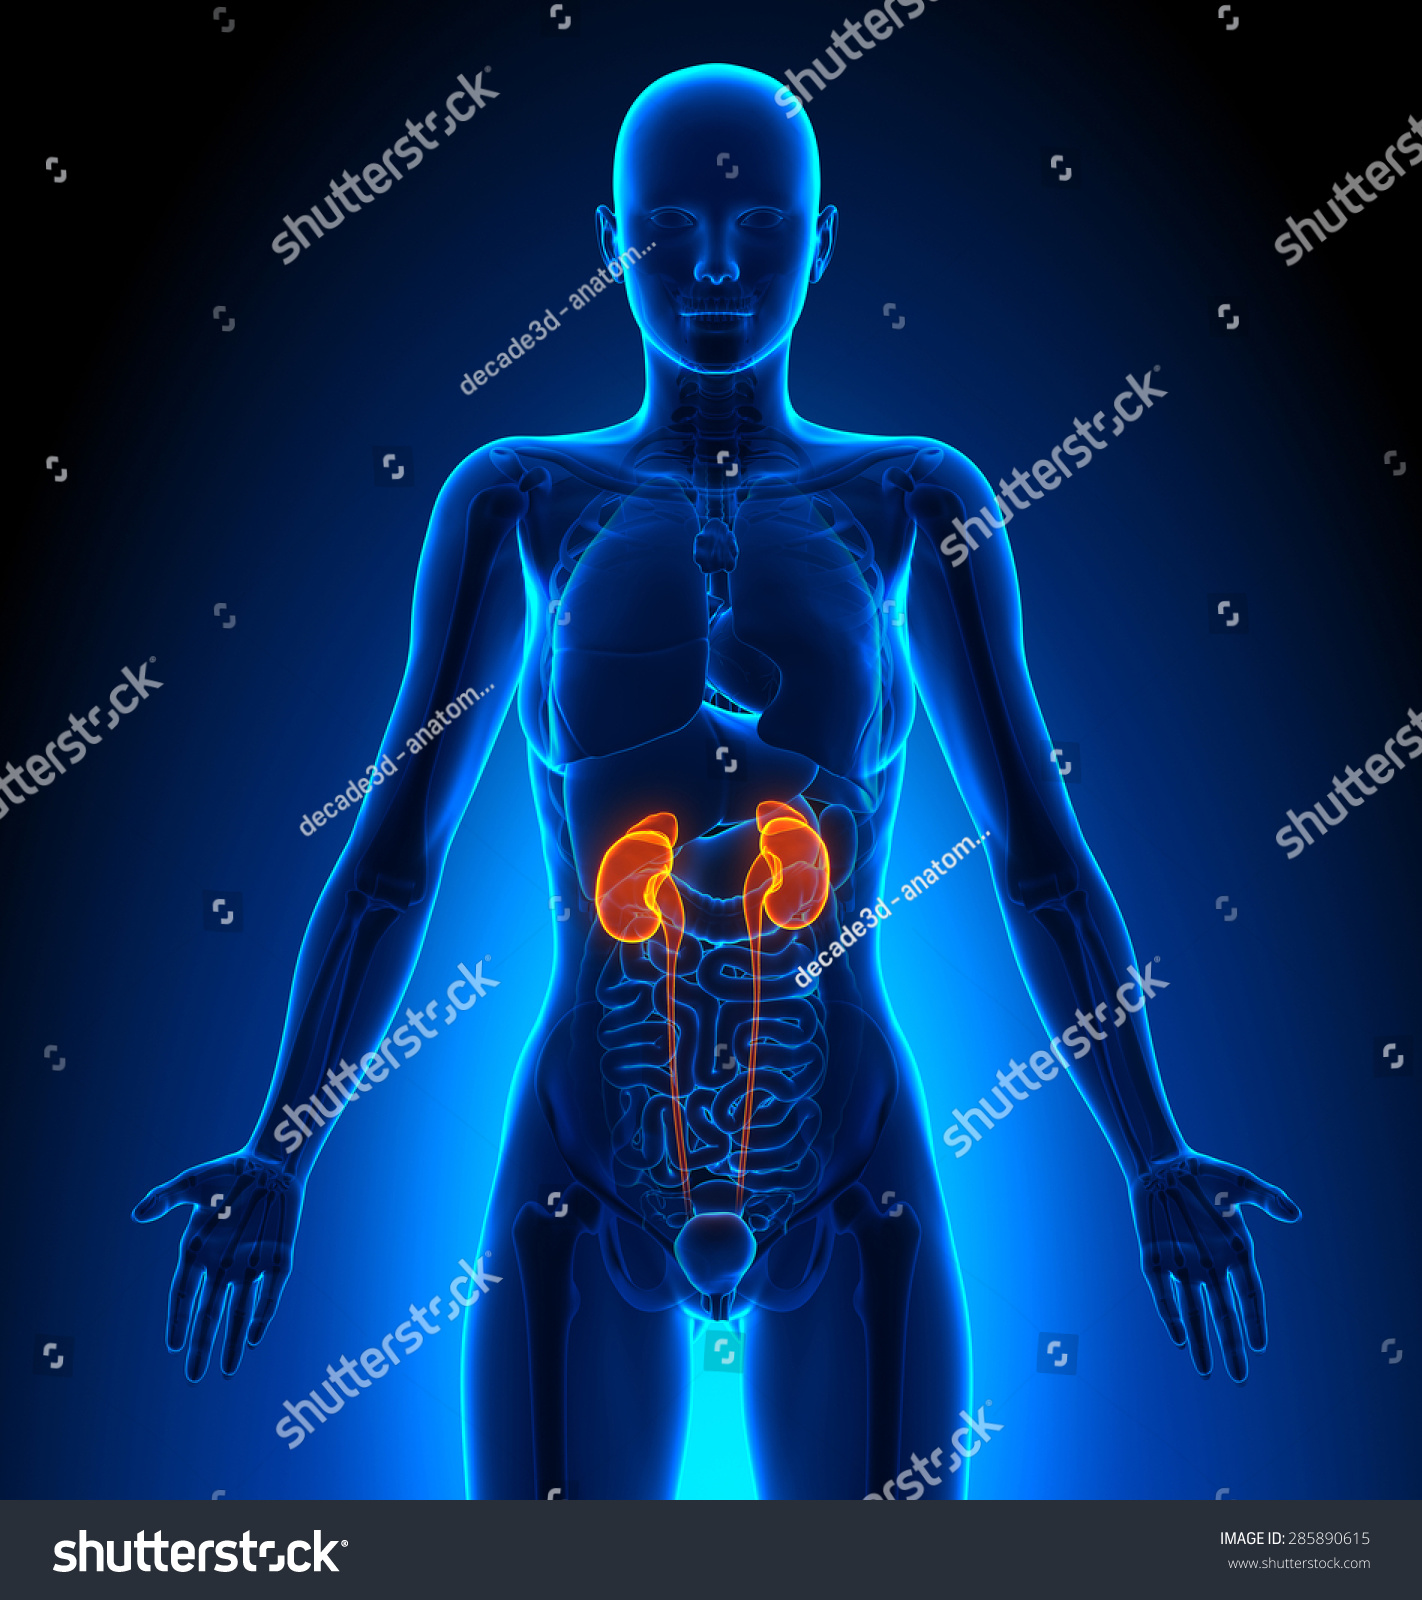 Kidneys Female Organs Human Anatomy Ez Canvas